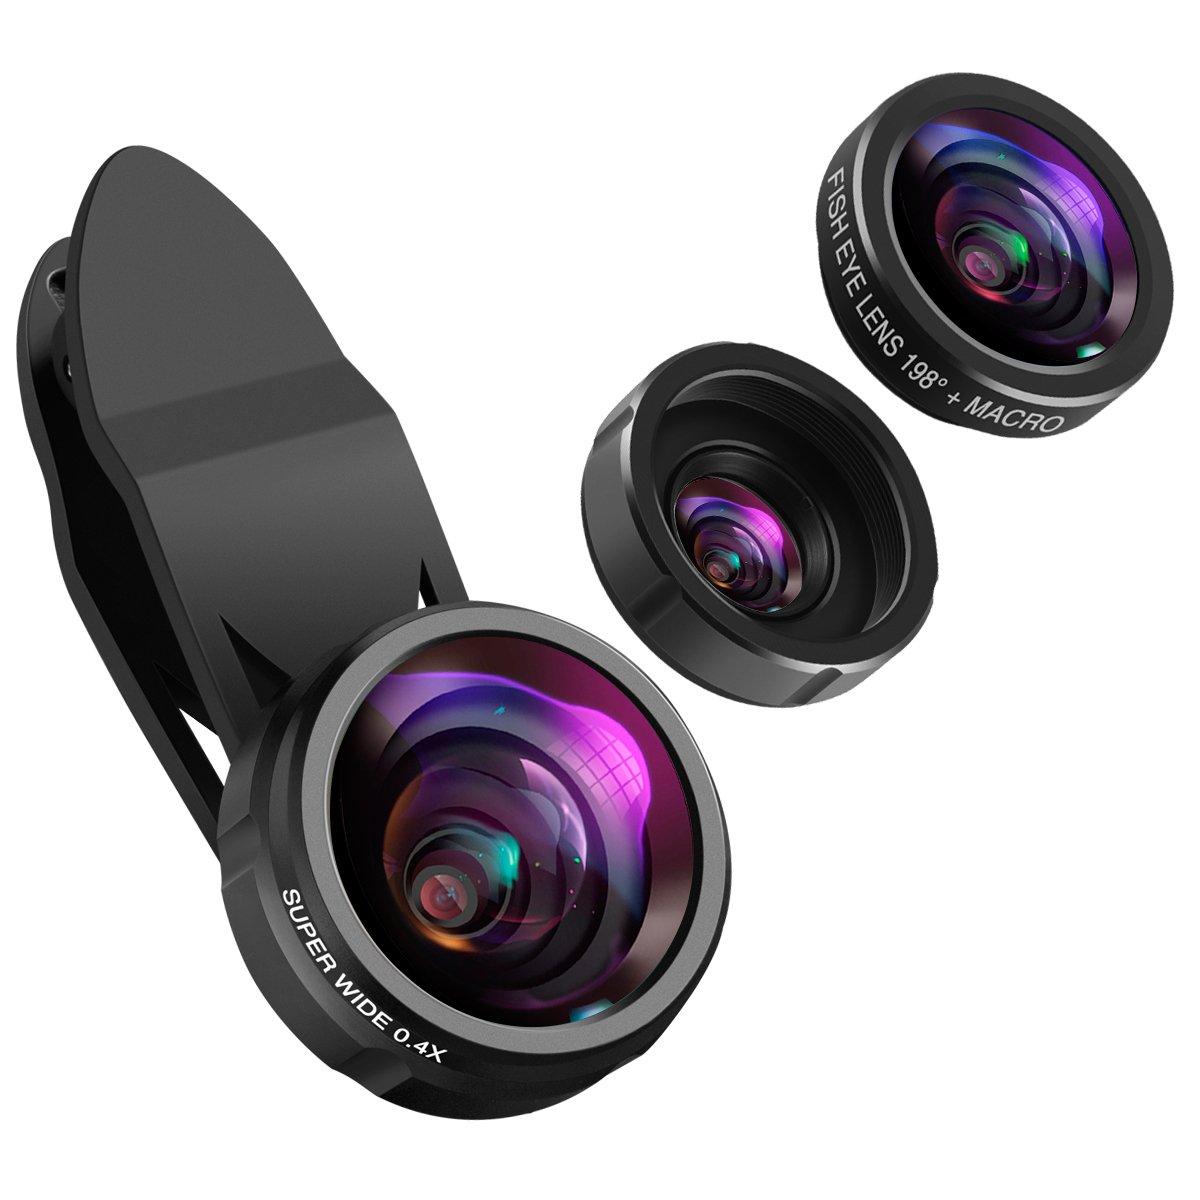 KeeKit Phone Camera Lens, Lens for iPhone, 198° Fisheye Lens + 0.4X Wide Angle Lens + 15X Macro Lens, 3-in-1 Clip on Phone Lens for iPhone X, 8, 8 Plus, 7, 7 Plus, 6S, 6, Samsung & Smartphones